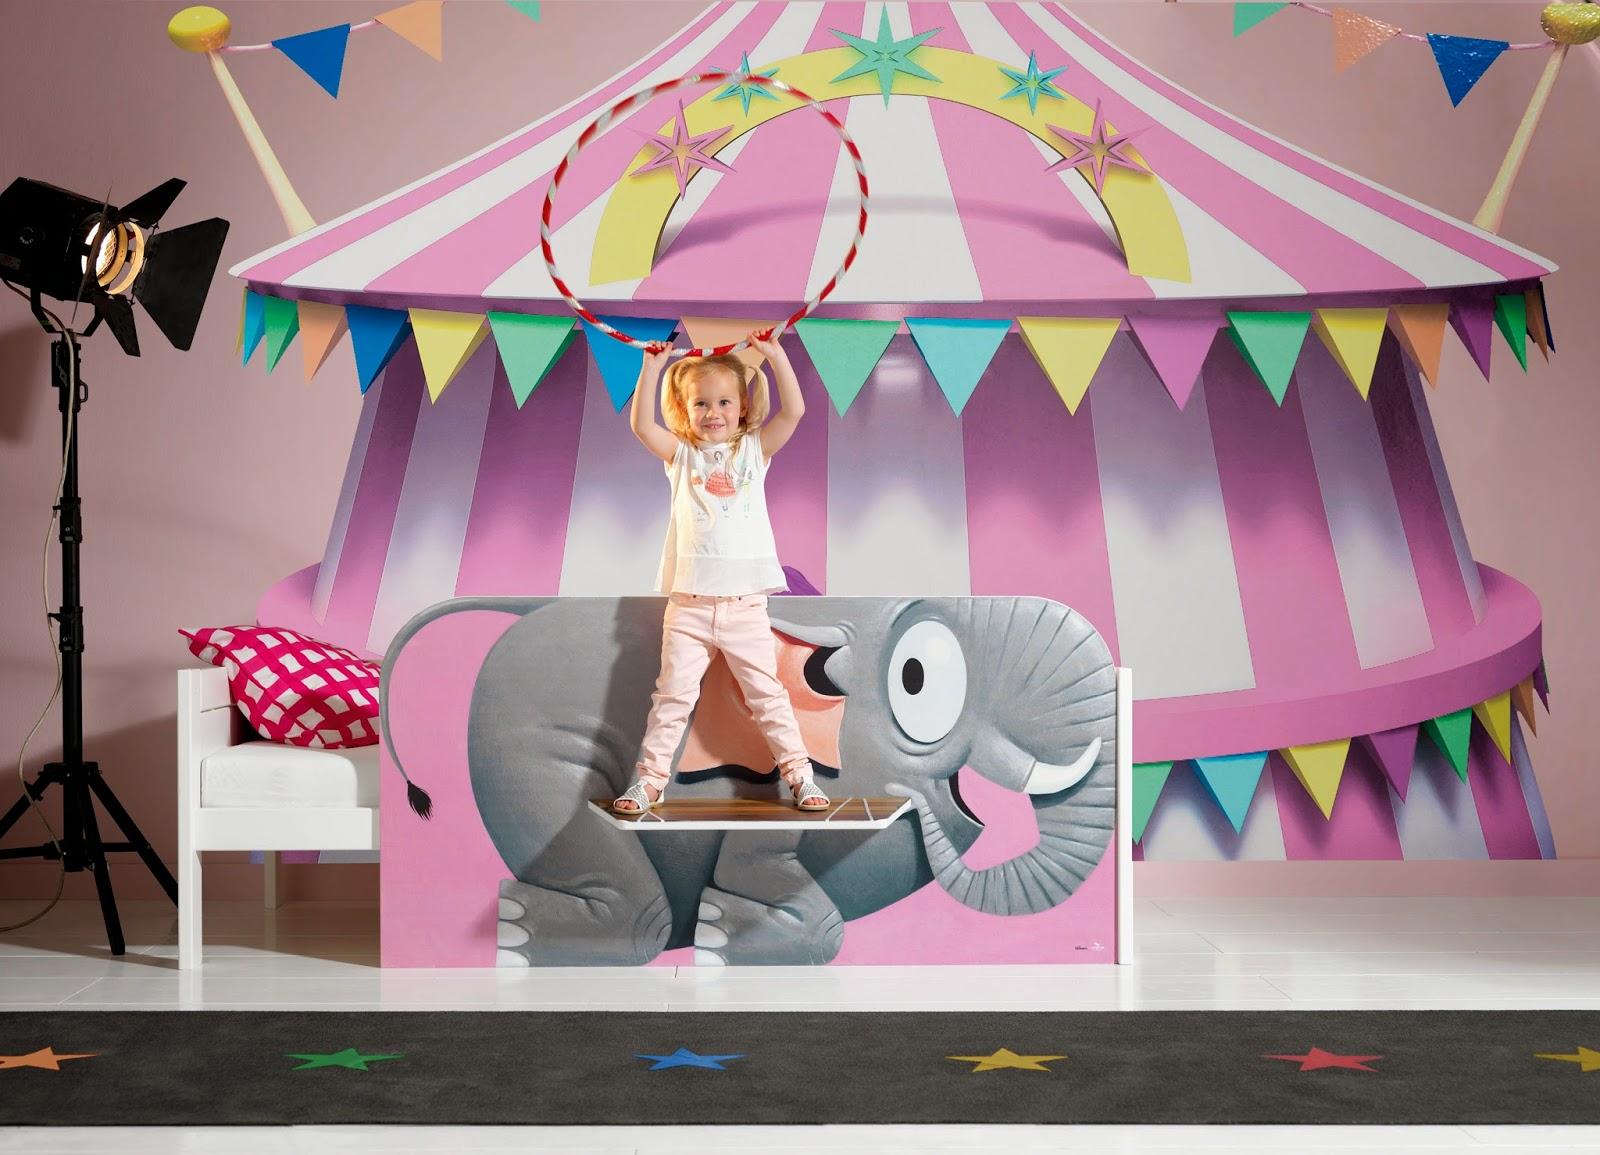 http://www.portobellostreet.es/mueble/27798/Cama-Infantil-Circus